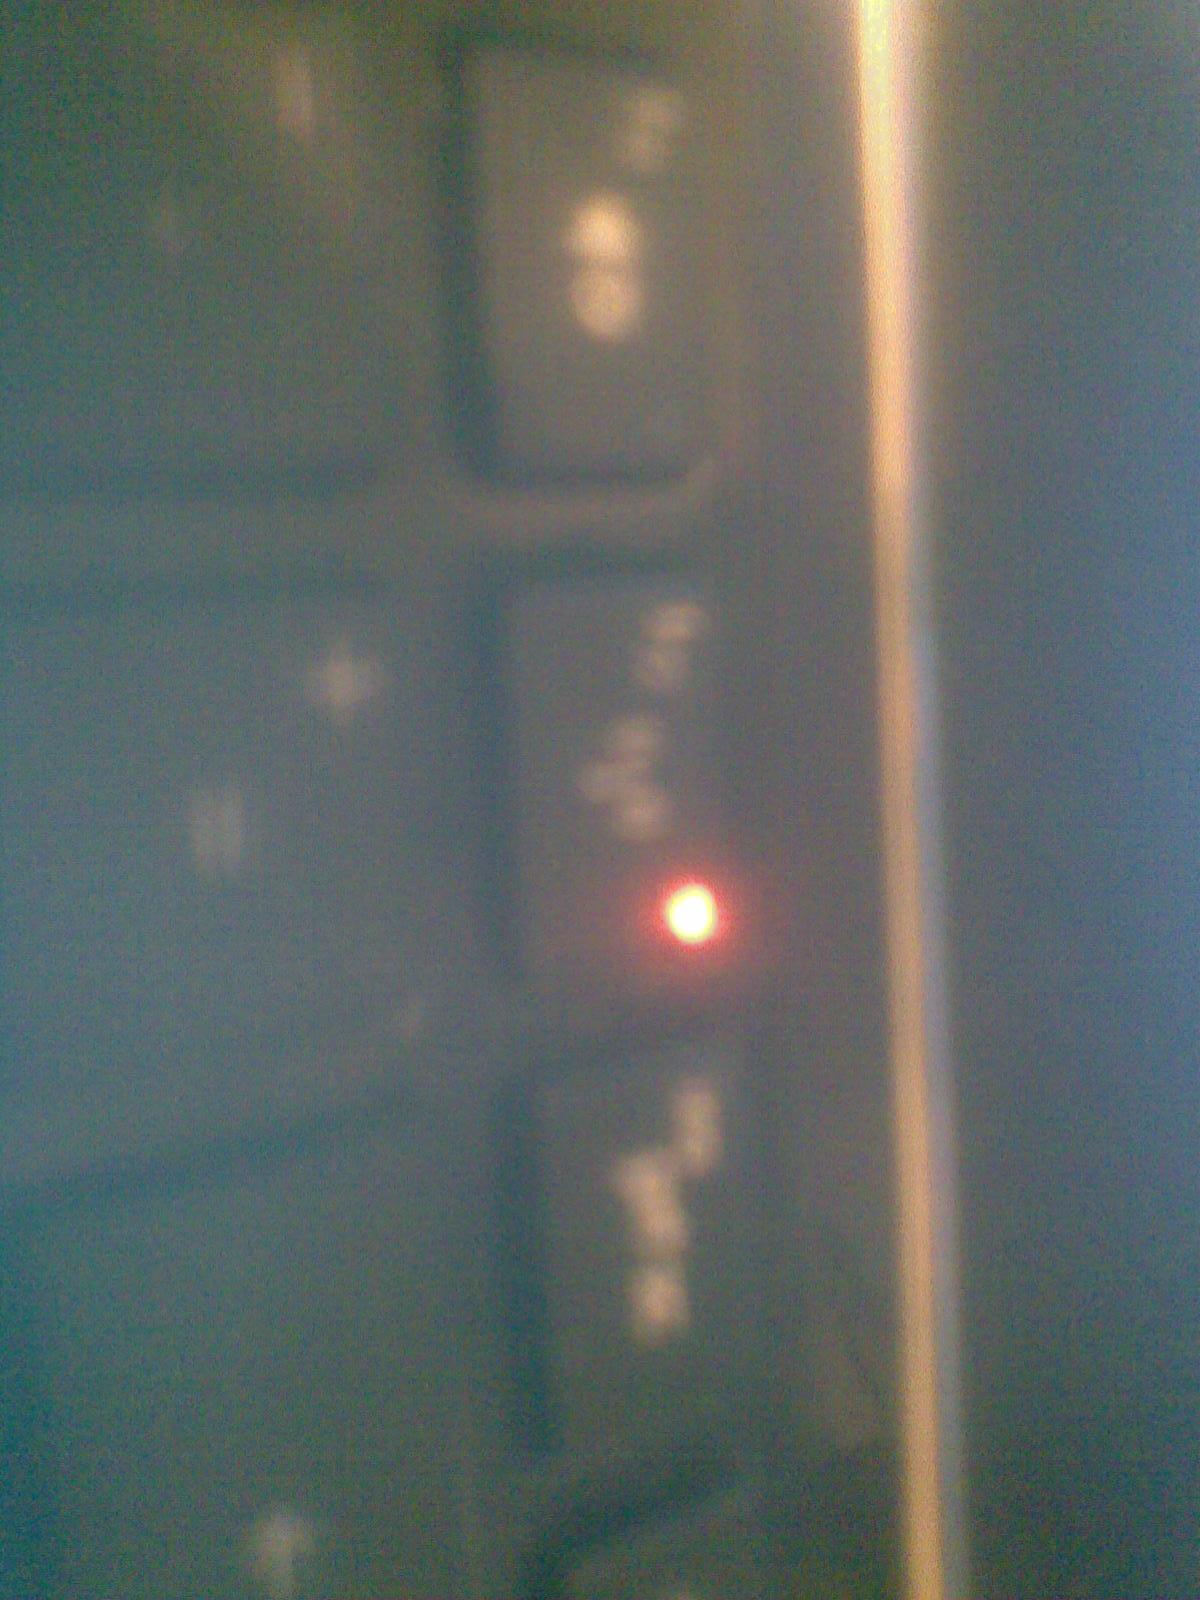 broadcom 802.11 b g wlan driver download xp